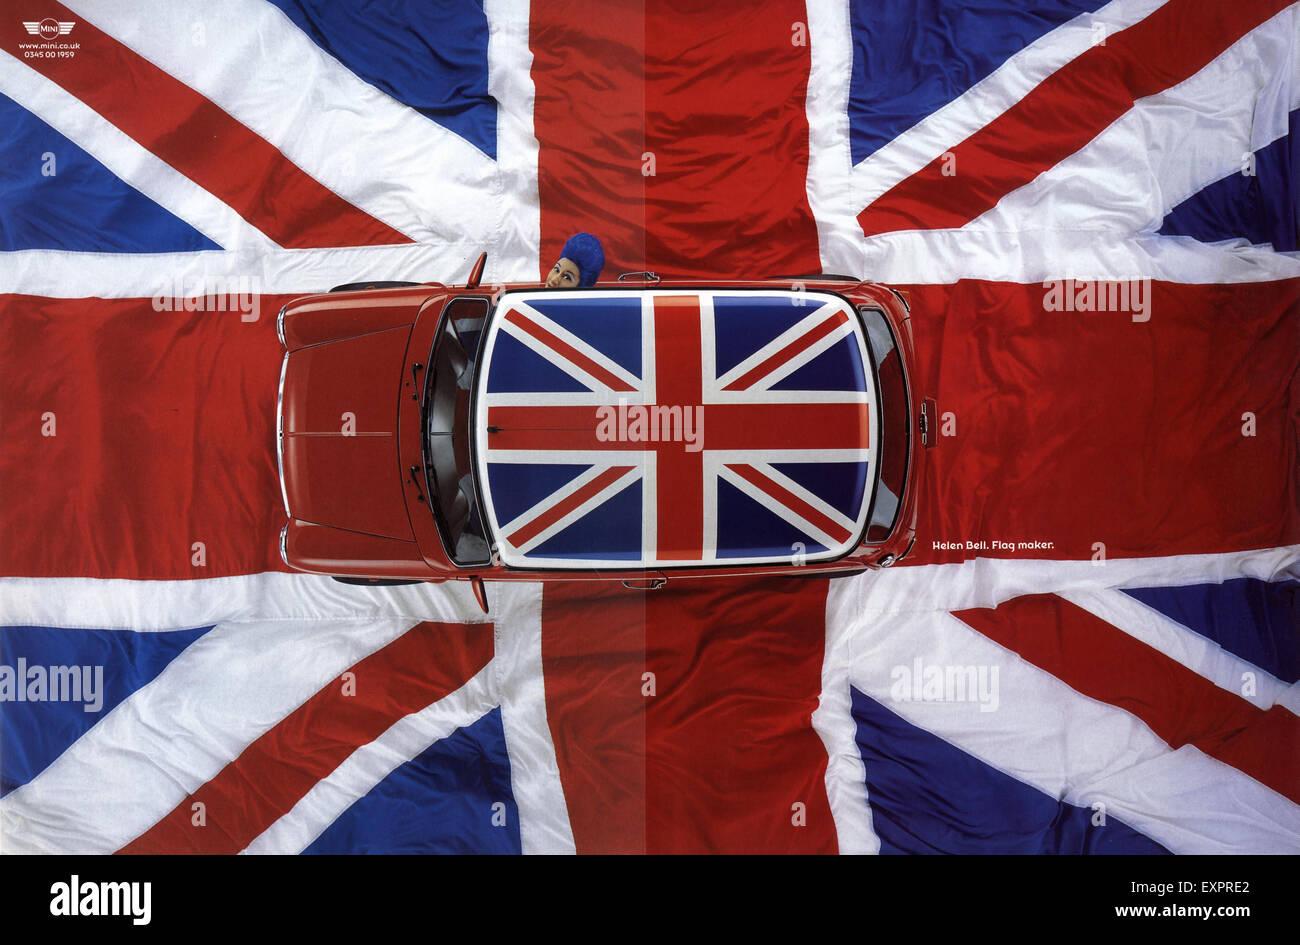 1990s UK Mini Cars Flags Magazine Advert - Stock Image